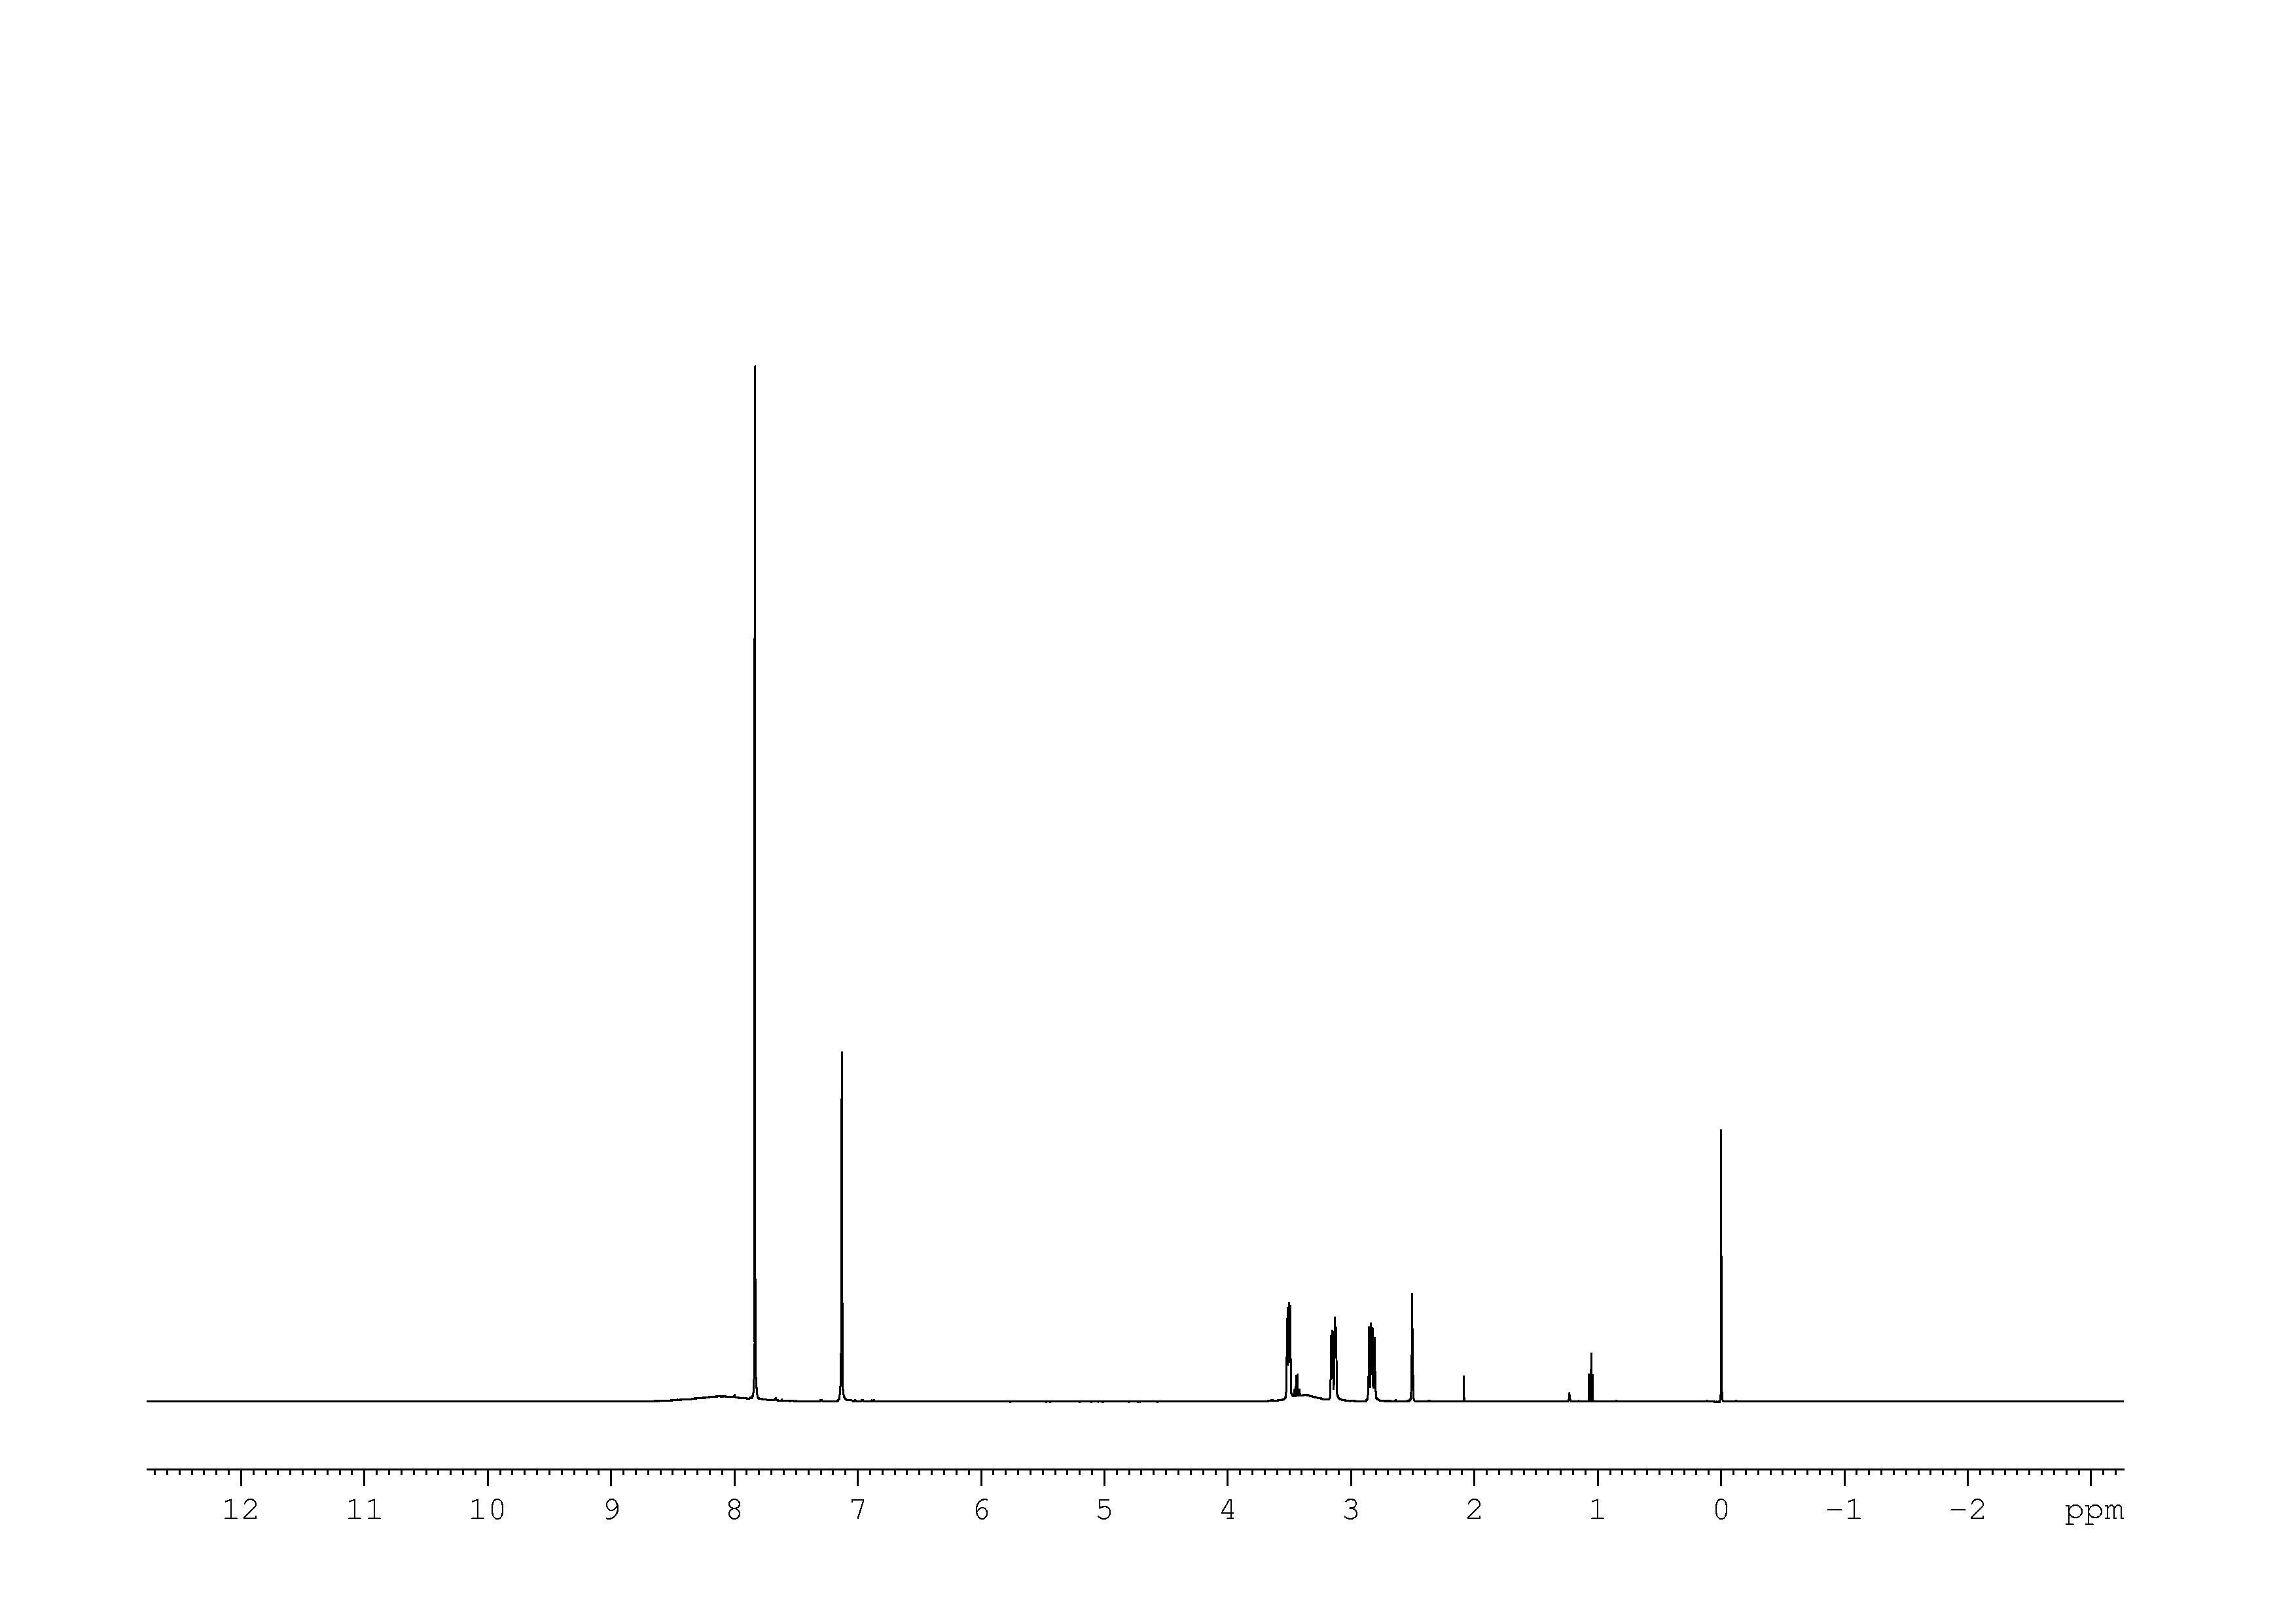 Bmse000923 L Thyroxine At Bmrb